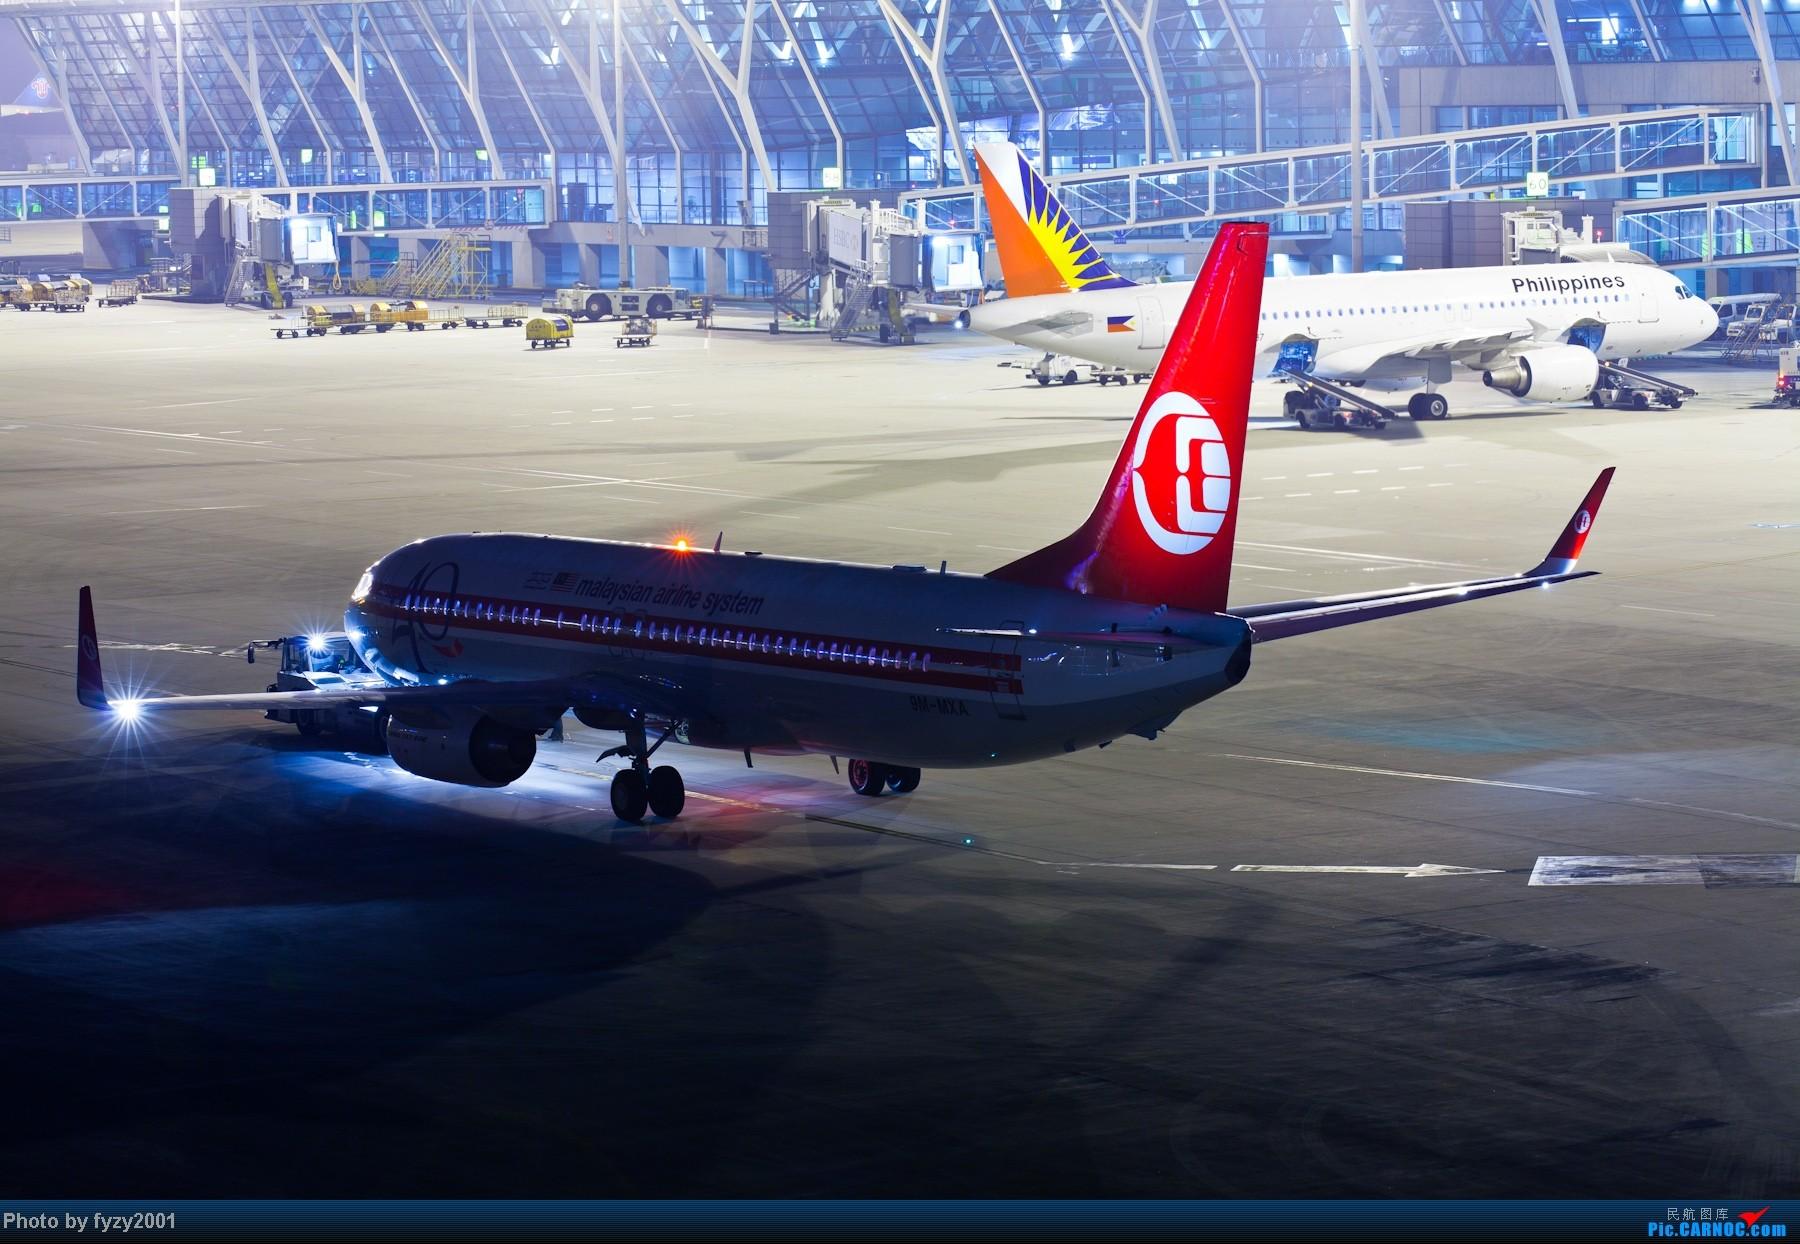 Re:[原创][无锡西站]RP爆表的拍摄-1800超大图 BOEING 737-800 9M-MXA 中国上海浦东机场